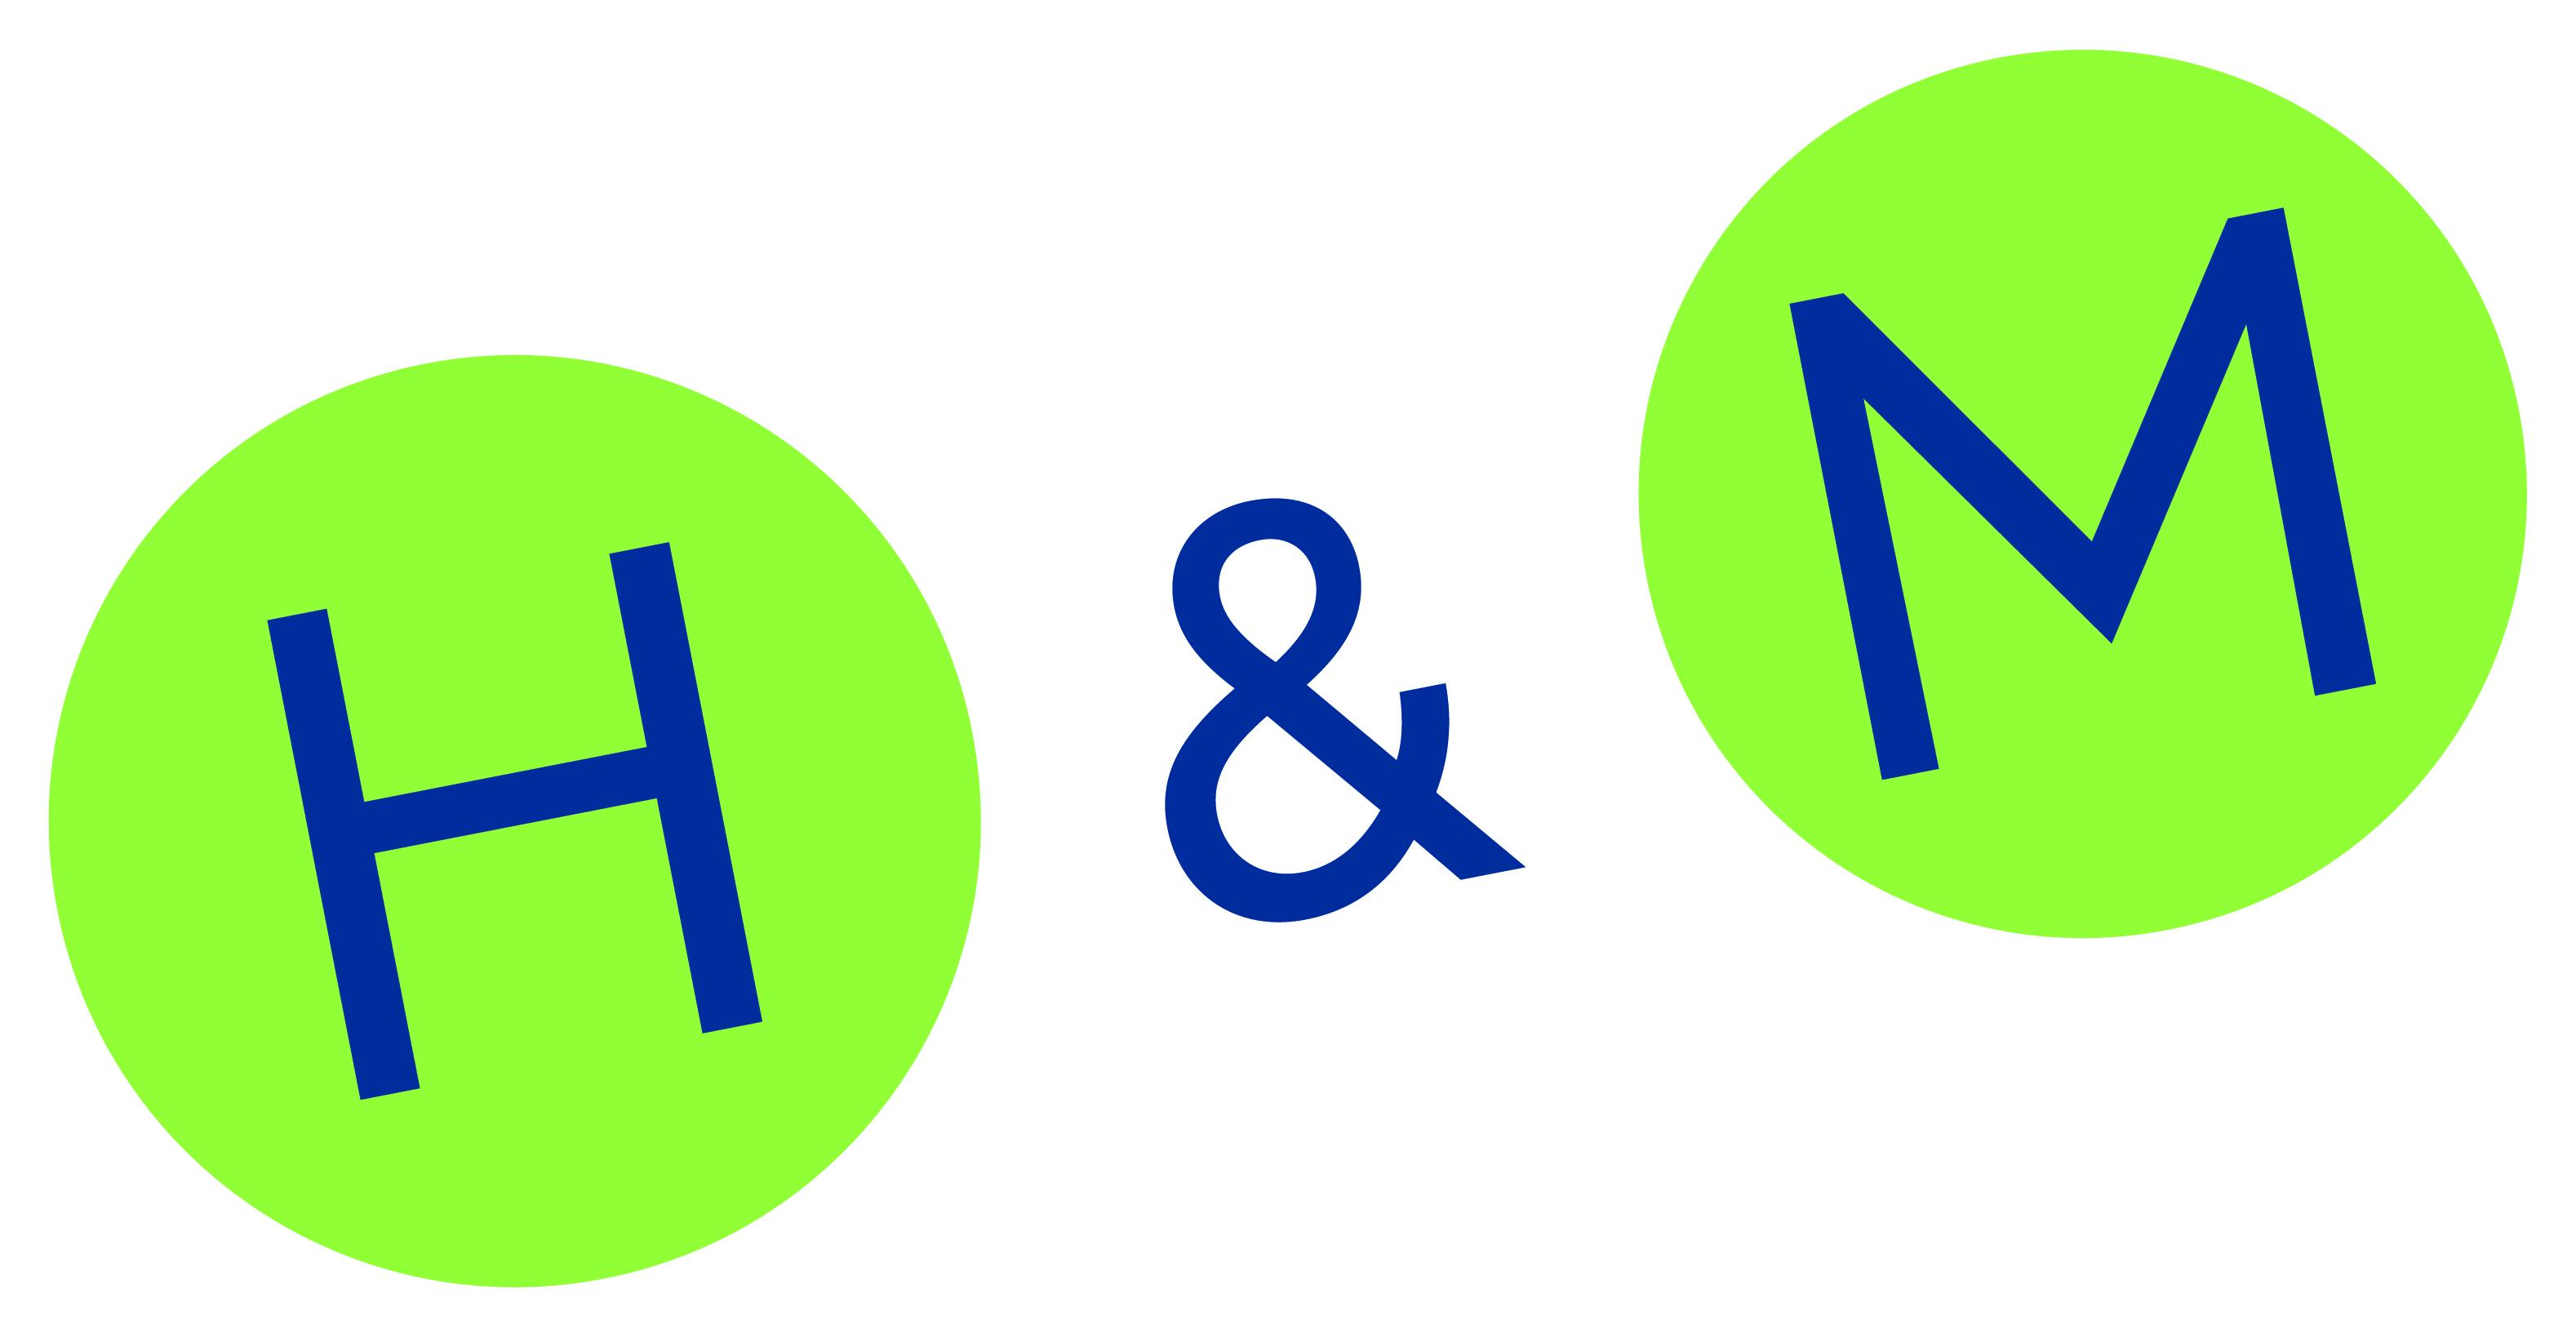 H&M Distribution